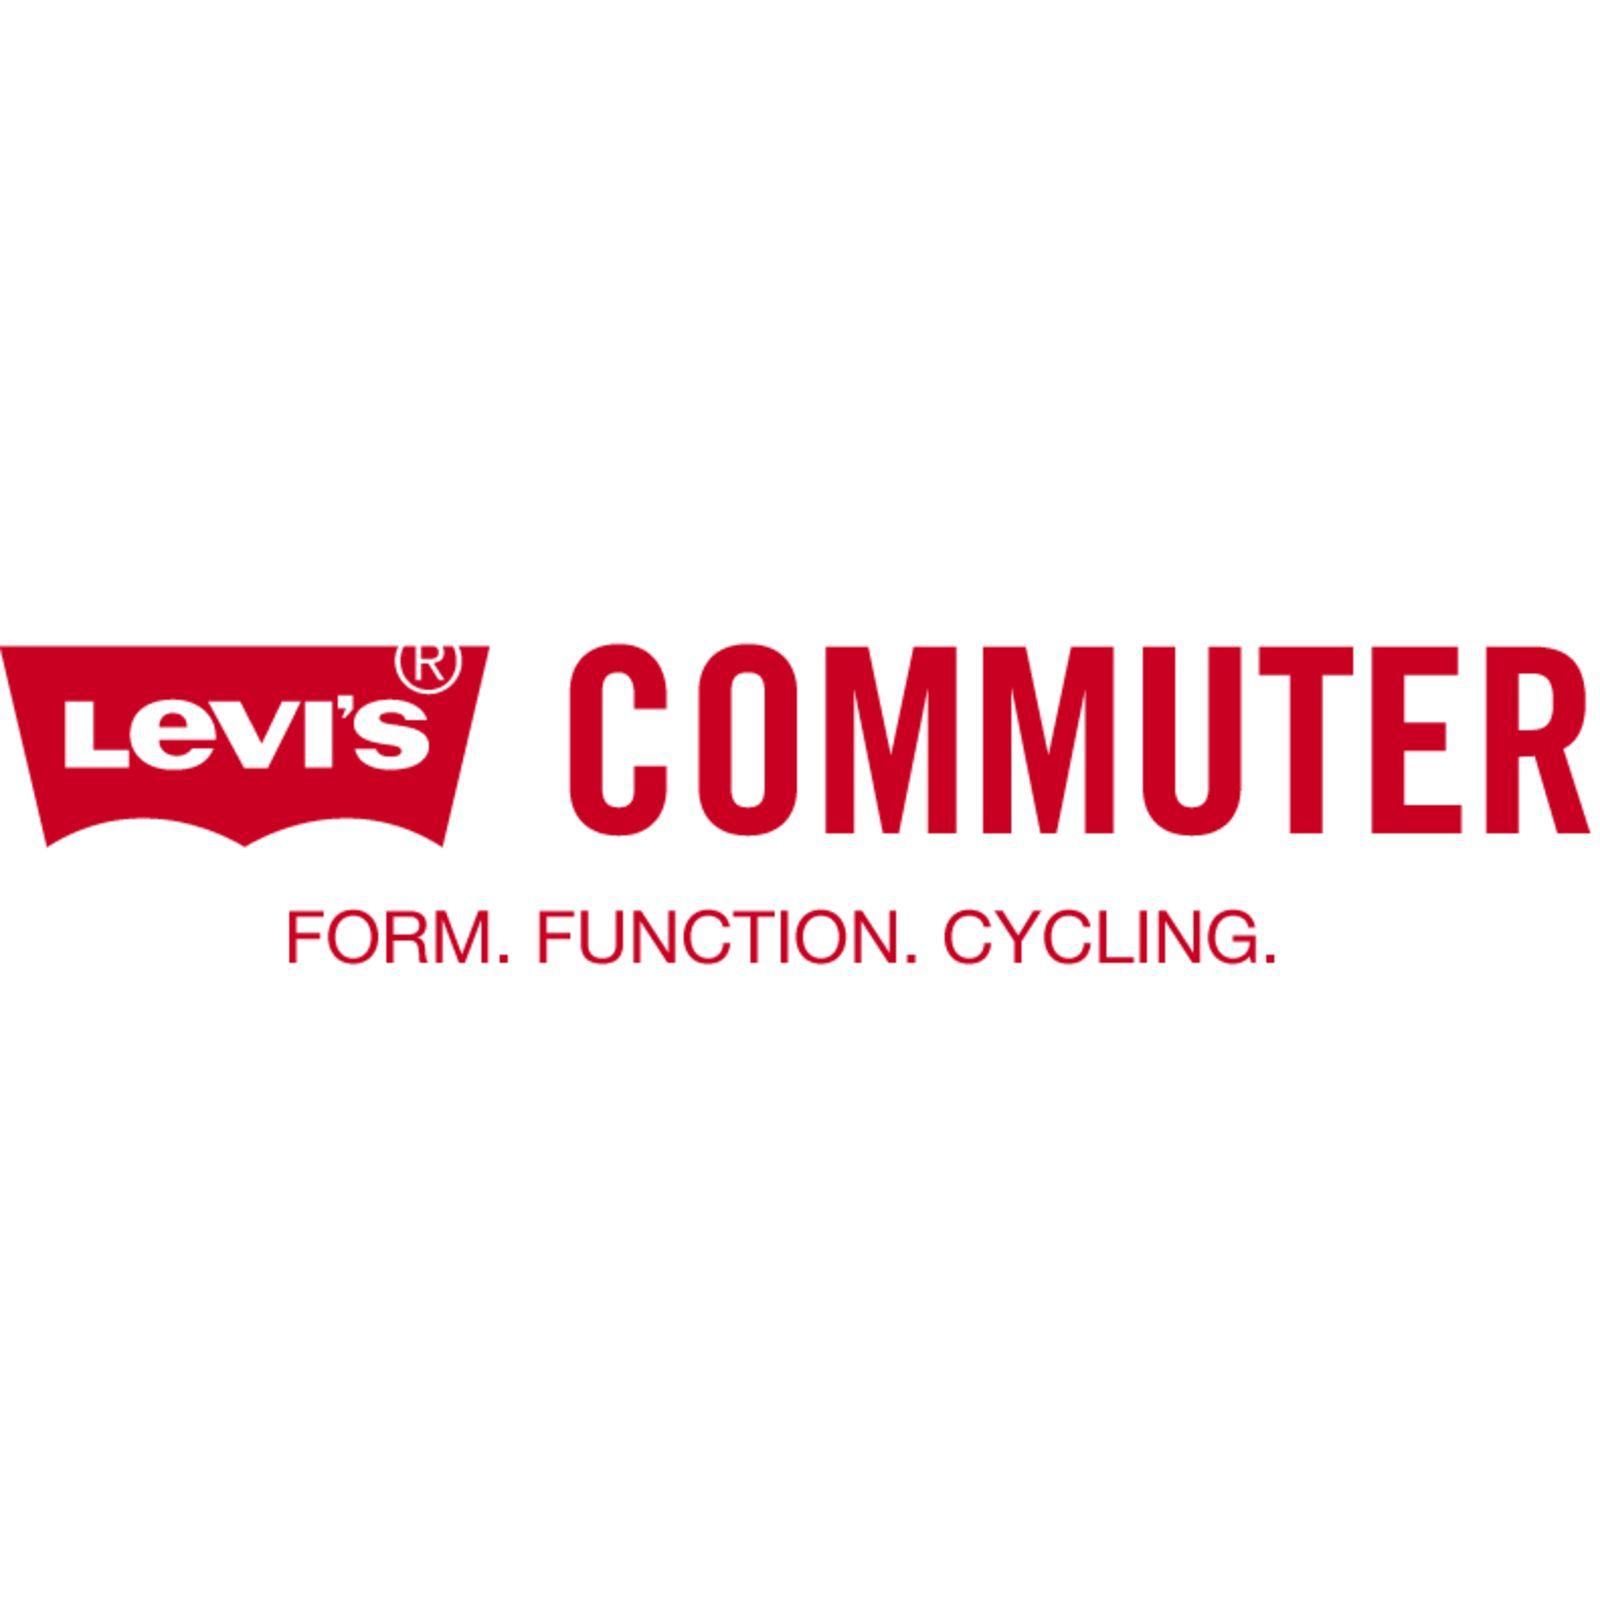 Levi's® COMMUTER (Bild 1)